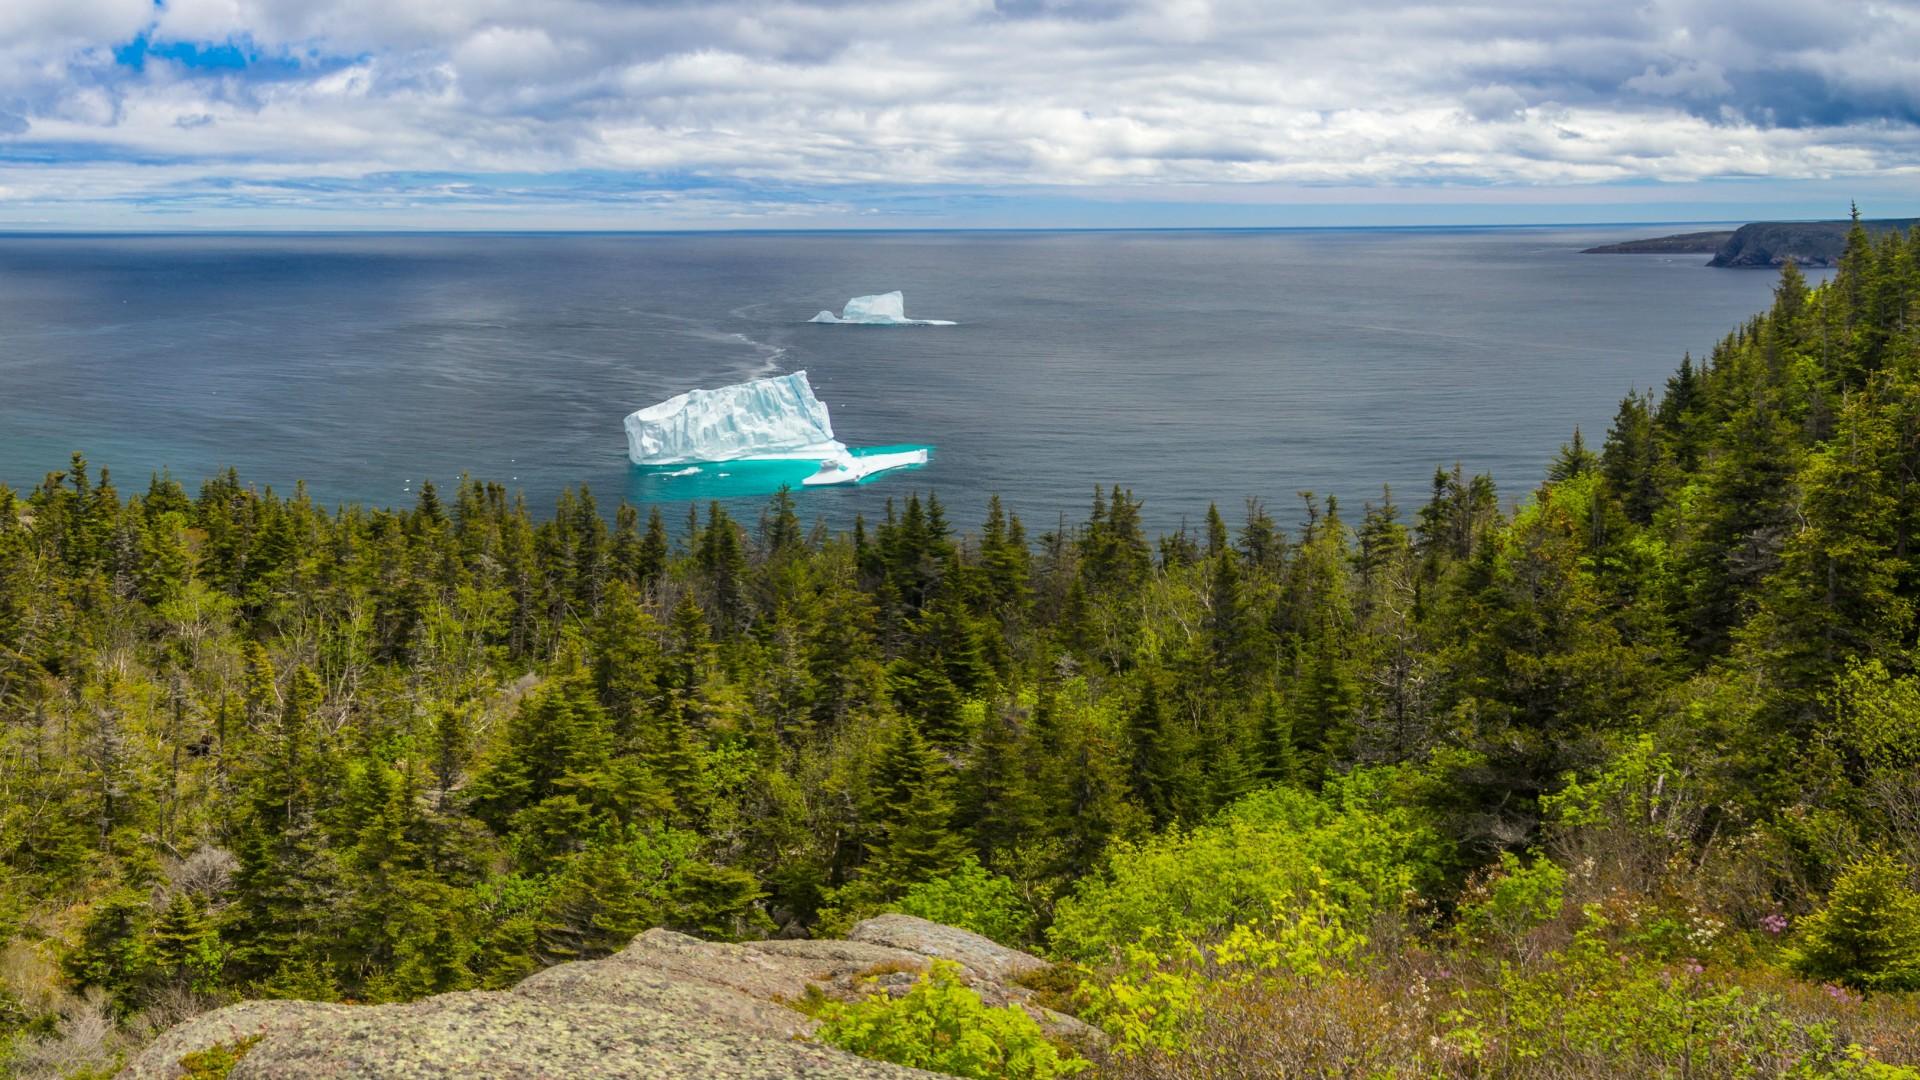 See icebergs along the Newfoundland coast